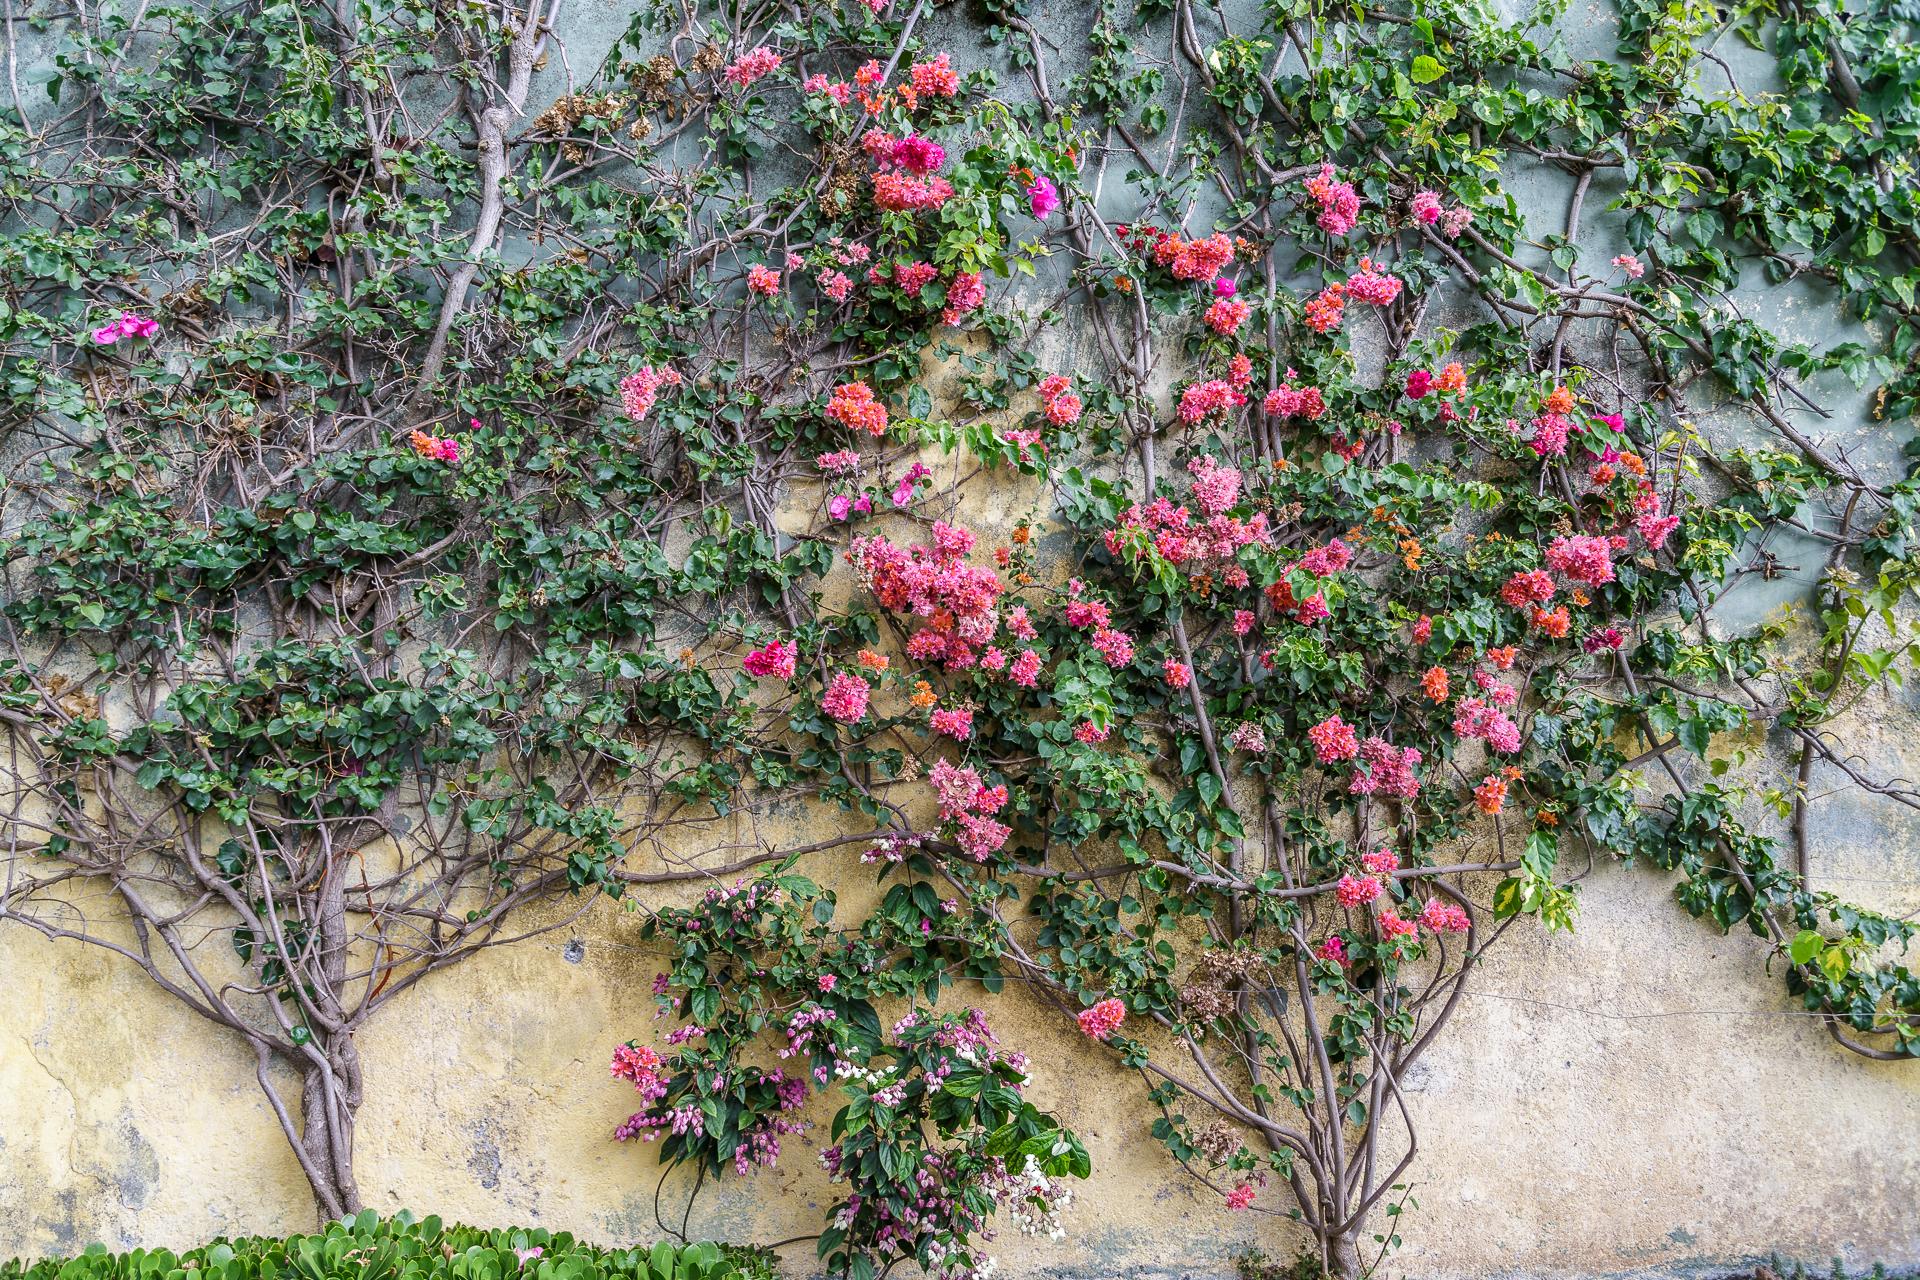 Jardim-Botanico-Funchal-3